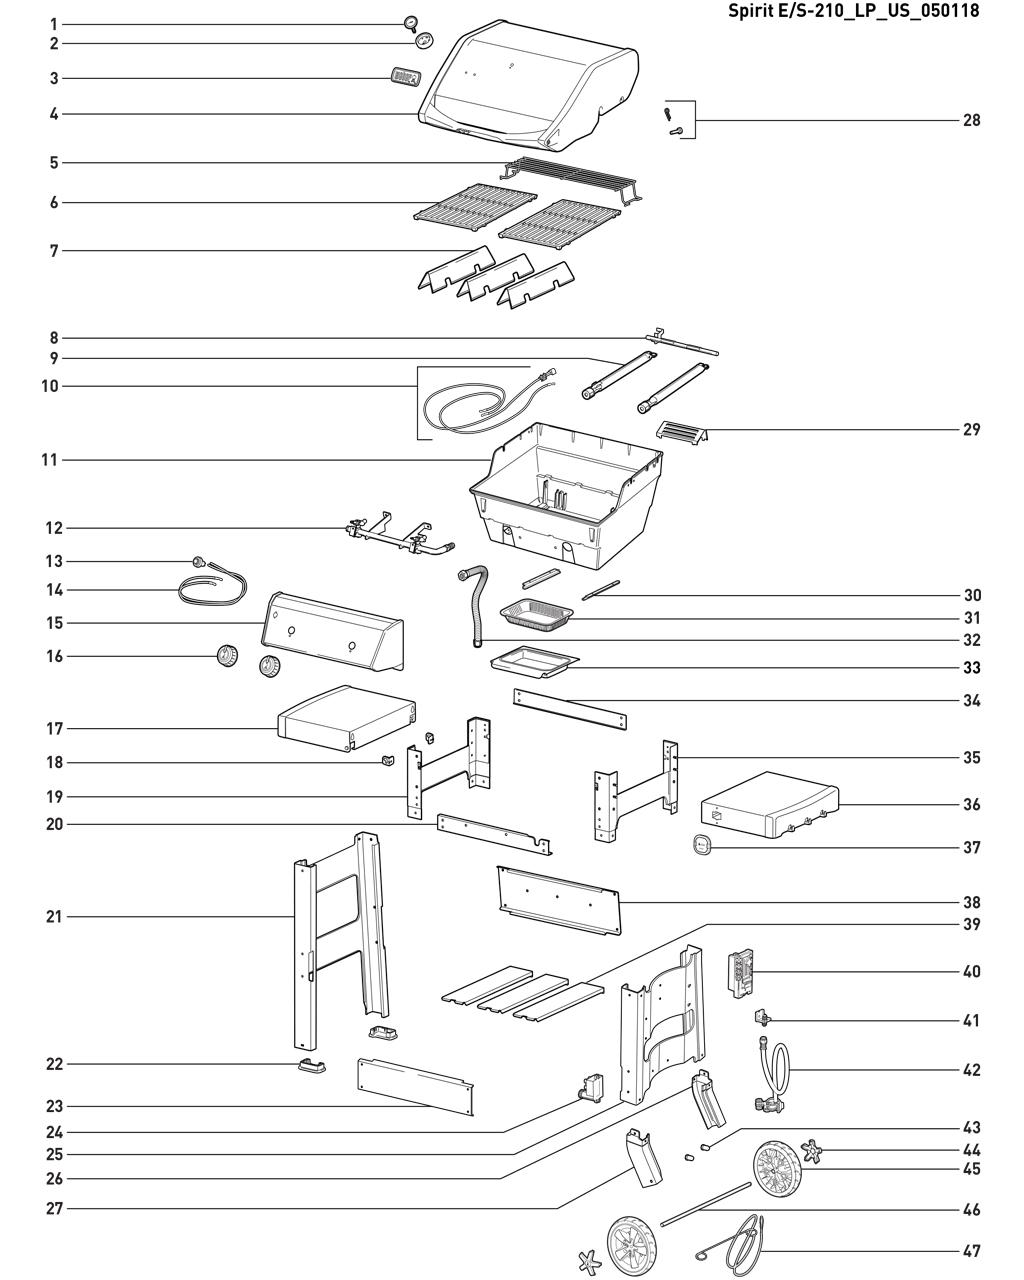 Schematic Image 44010001